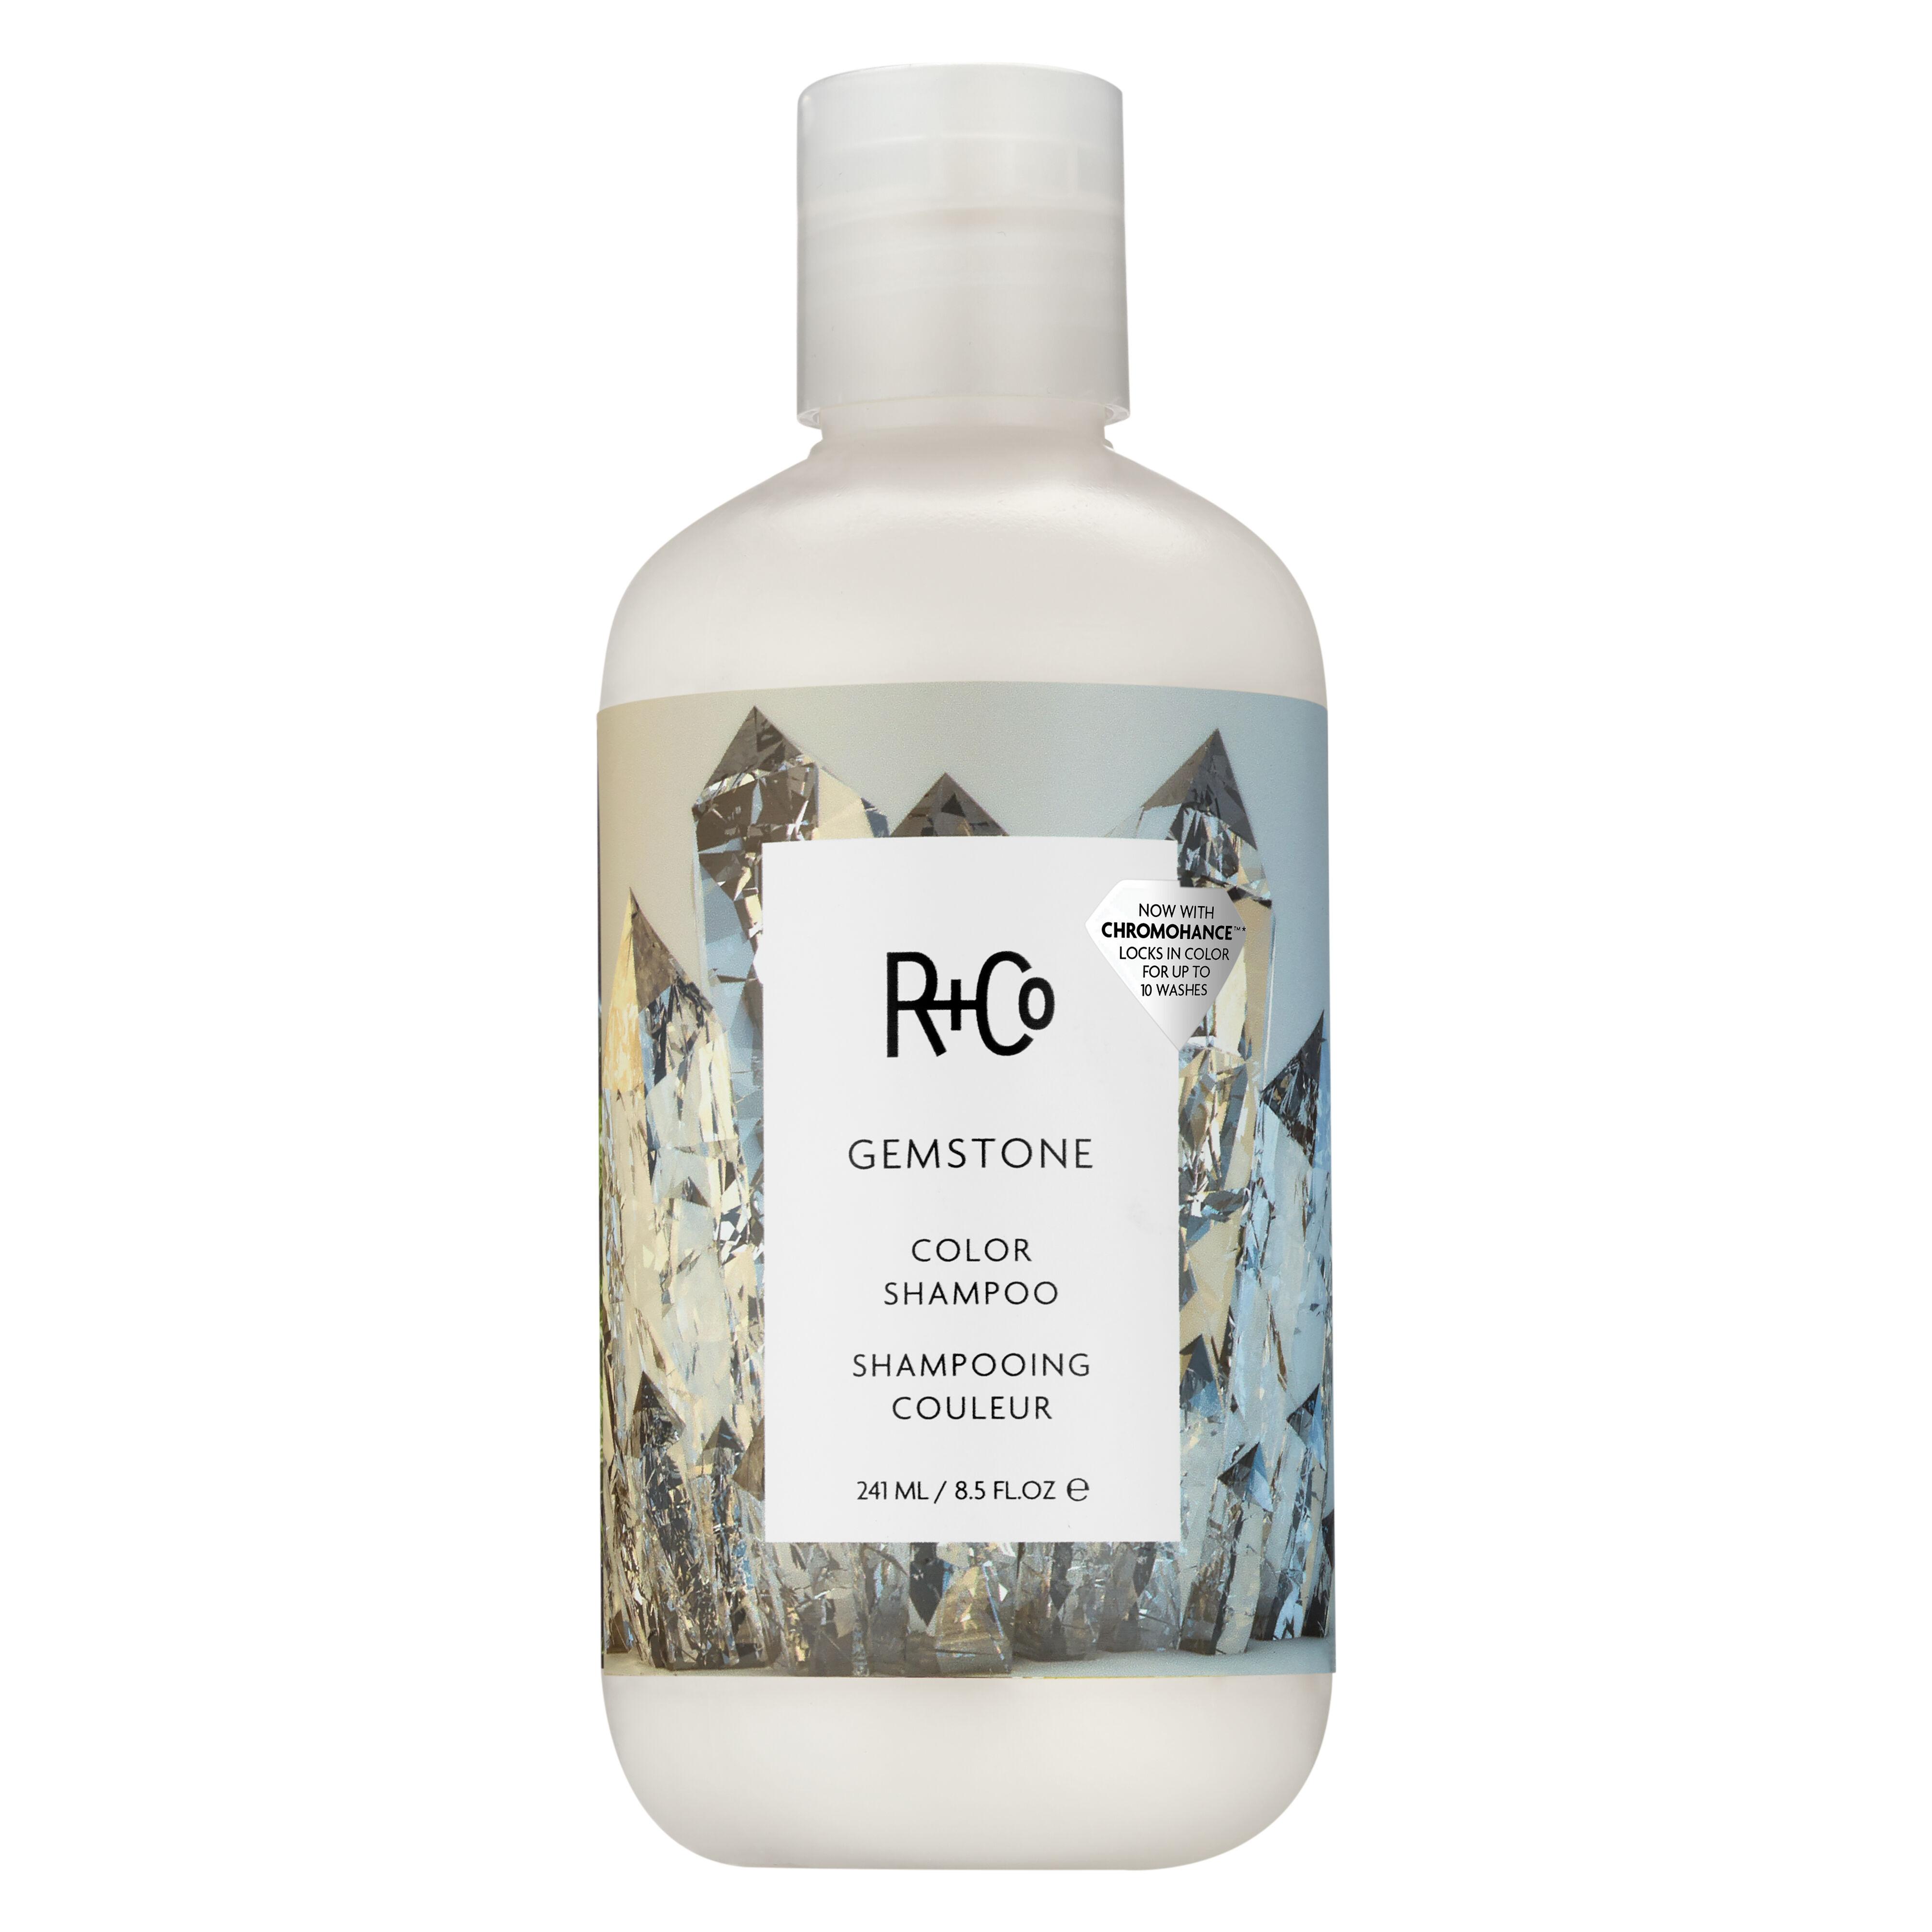 rco-gemstone-color-shampoo-241ml-1971-154-0241_1